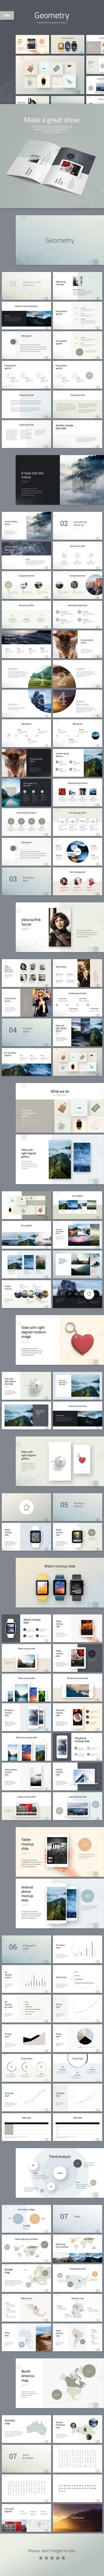 Geometry Modern PowerPoint Presentation Template